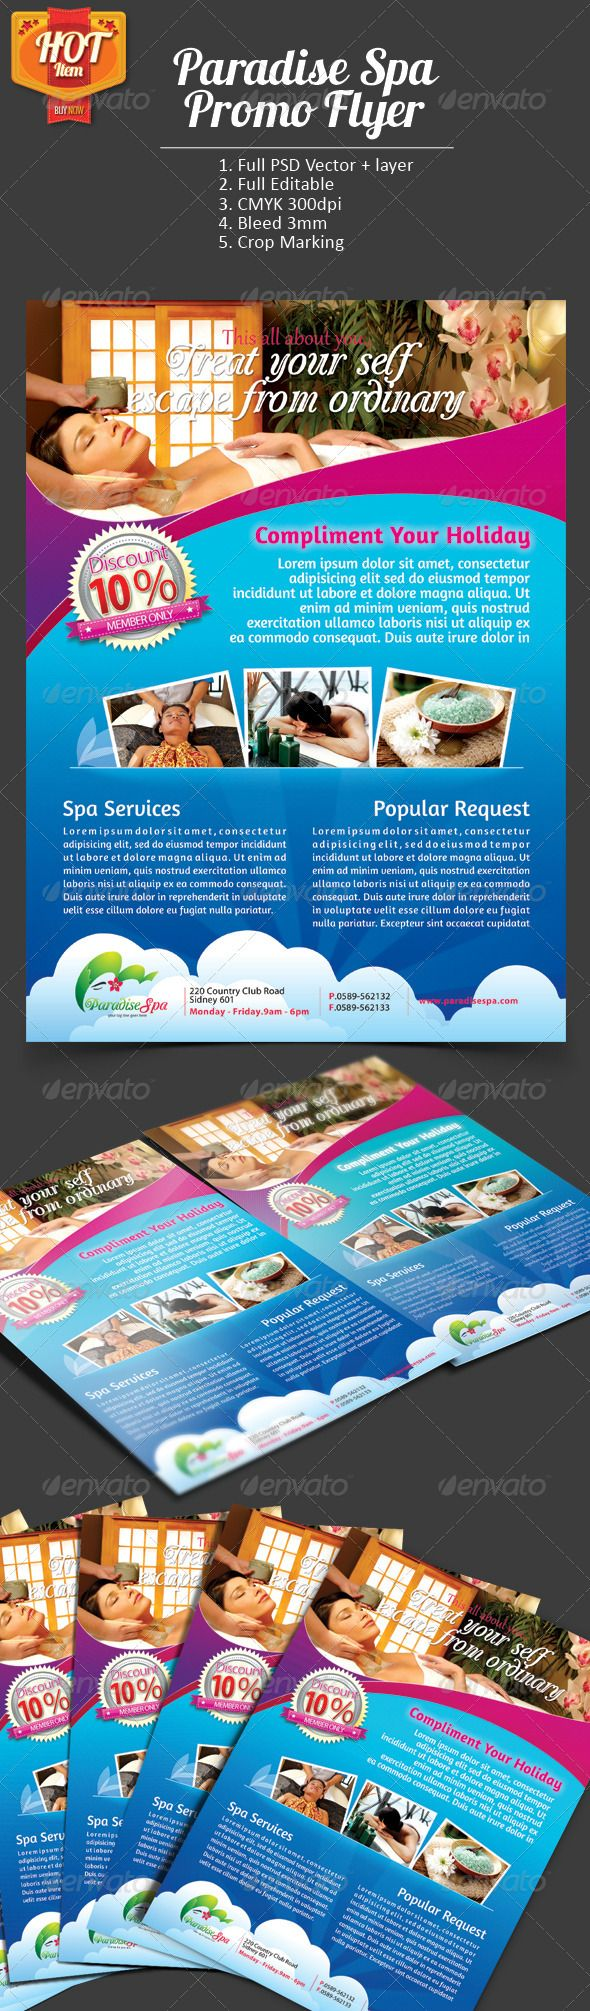 Paradise Spa Promo Flyer  #GraphicRiver